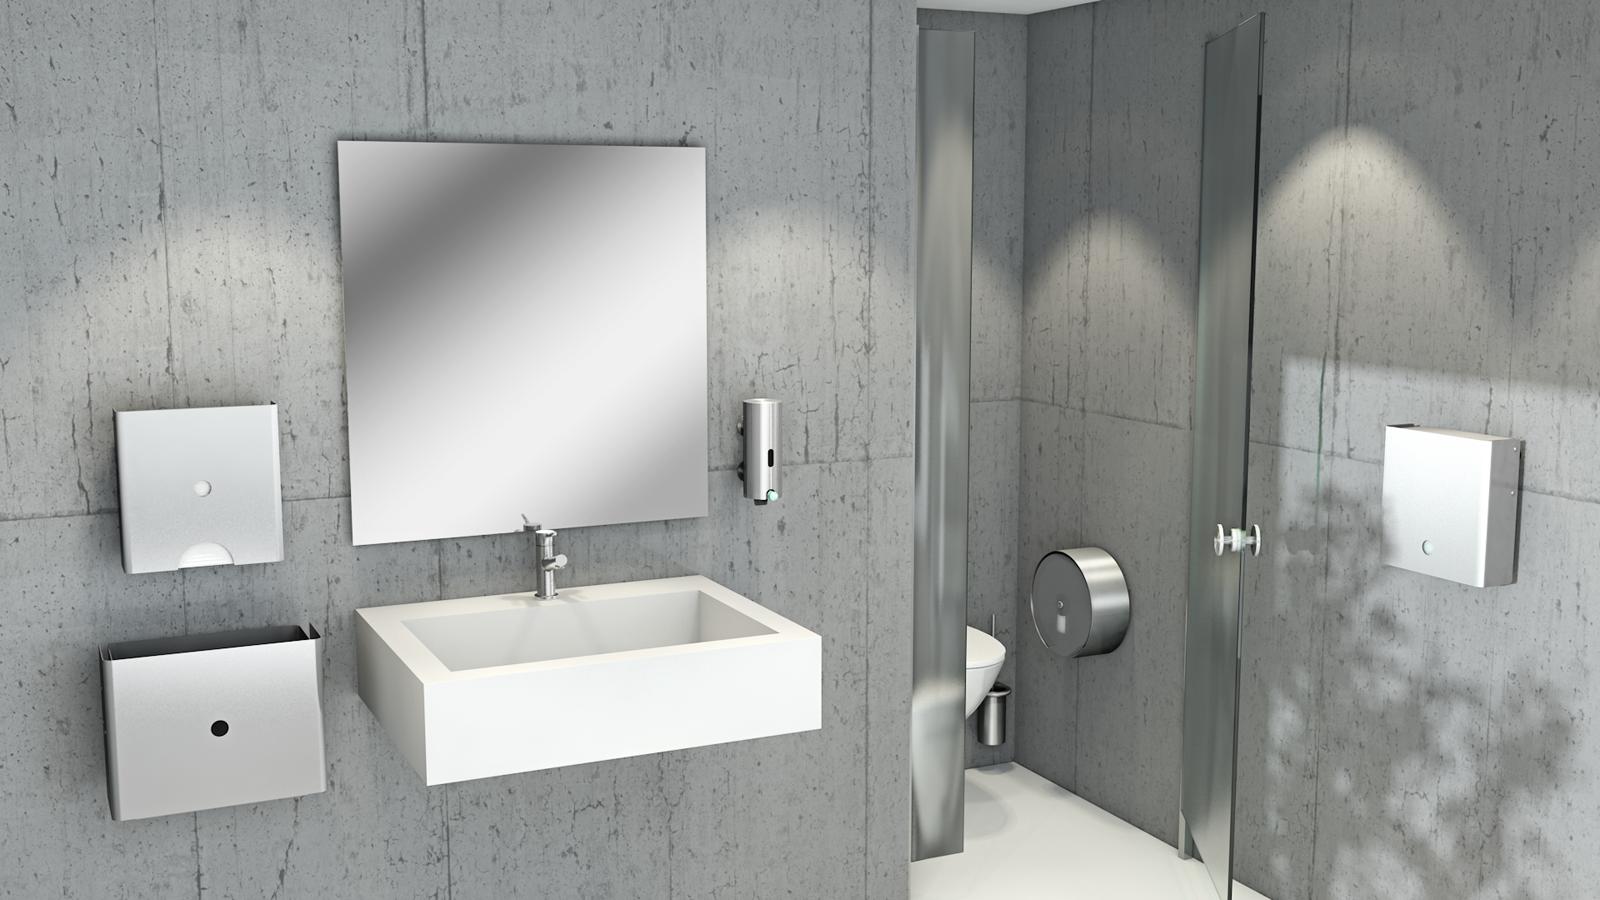 06_Toiletforrum_1_vask05b